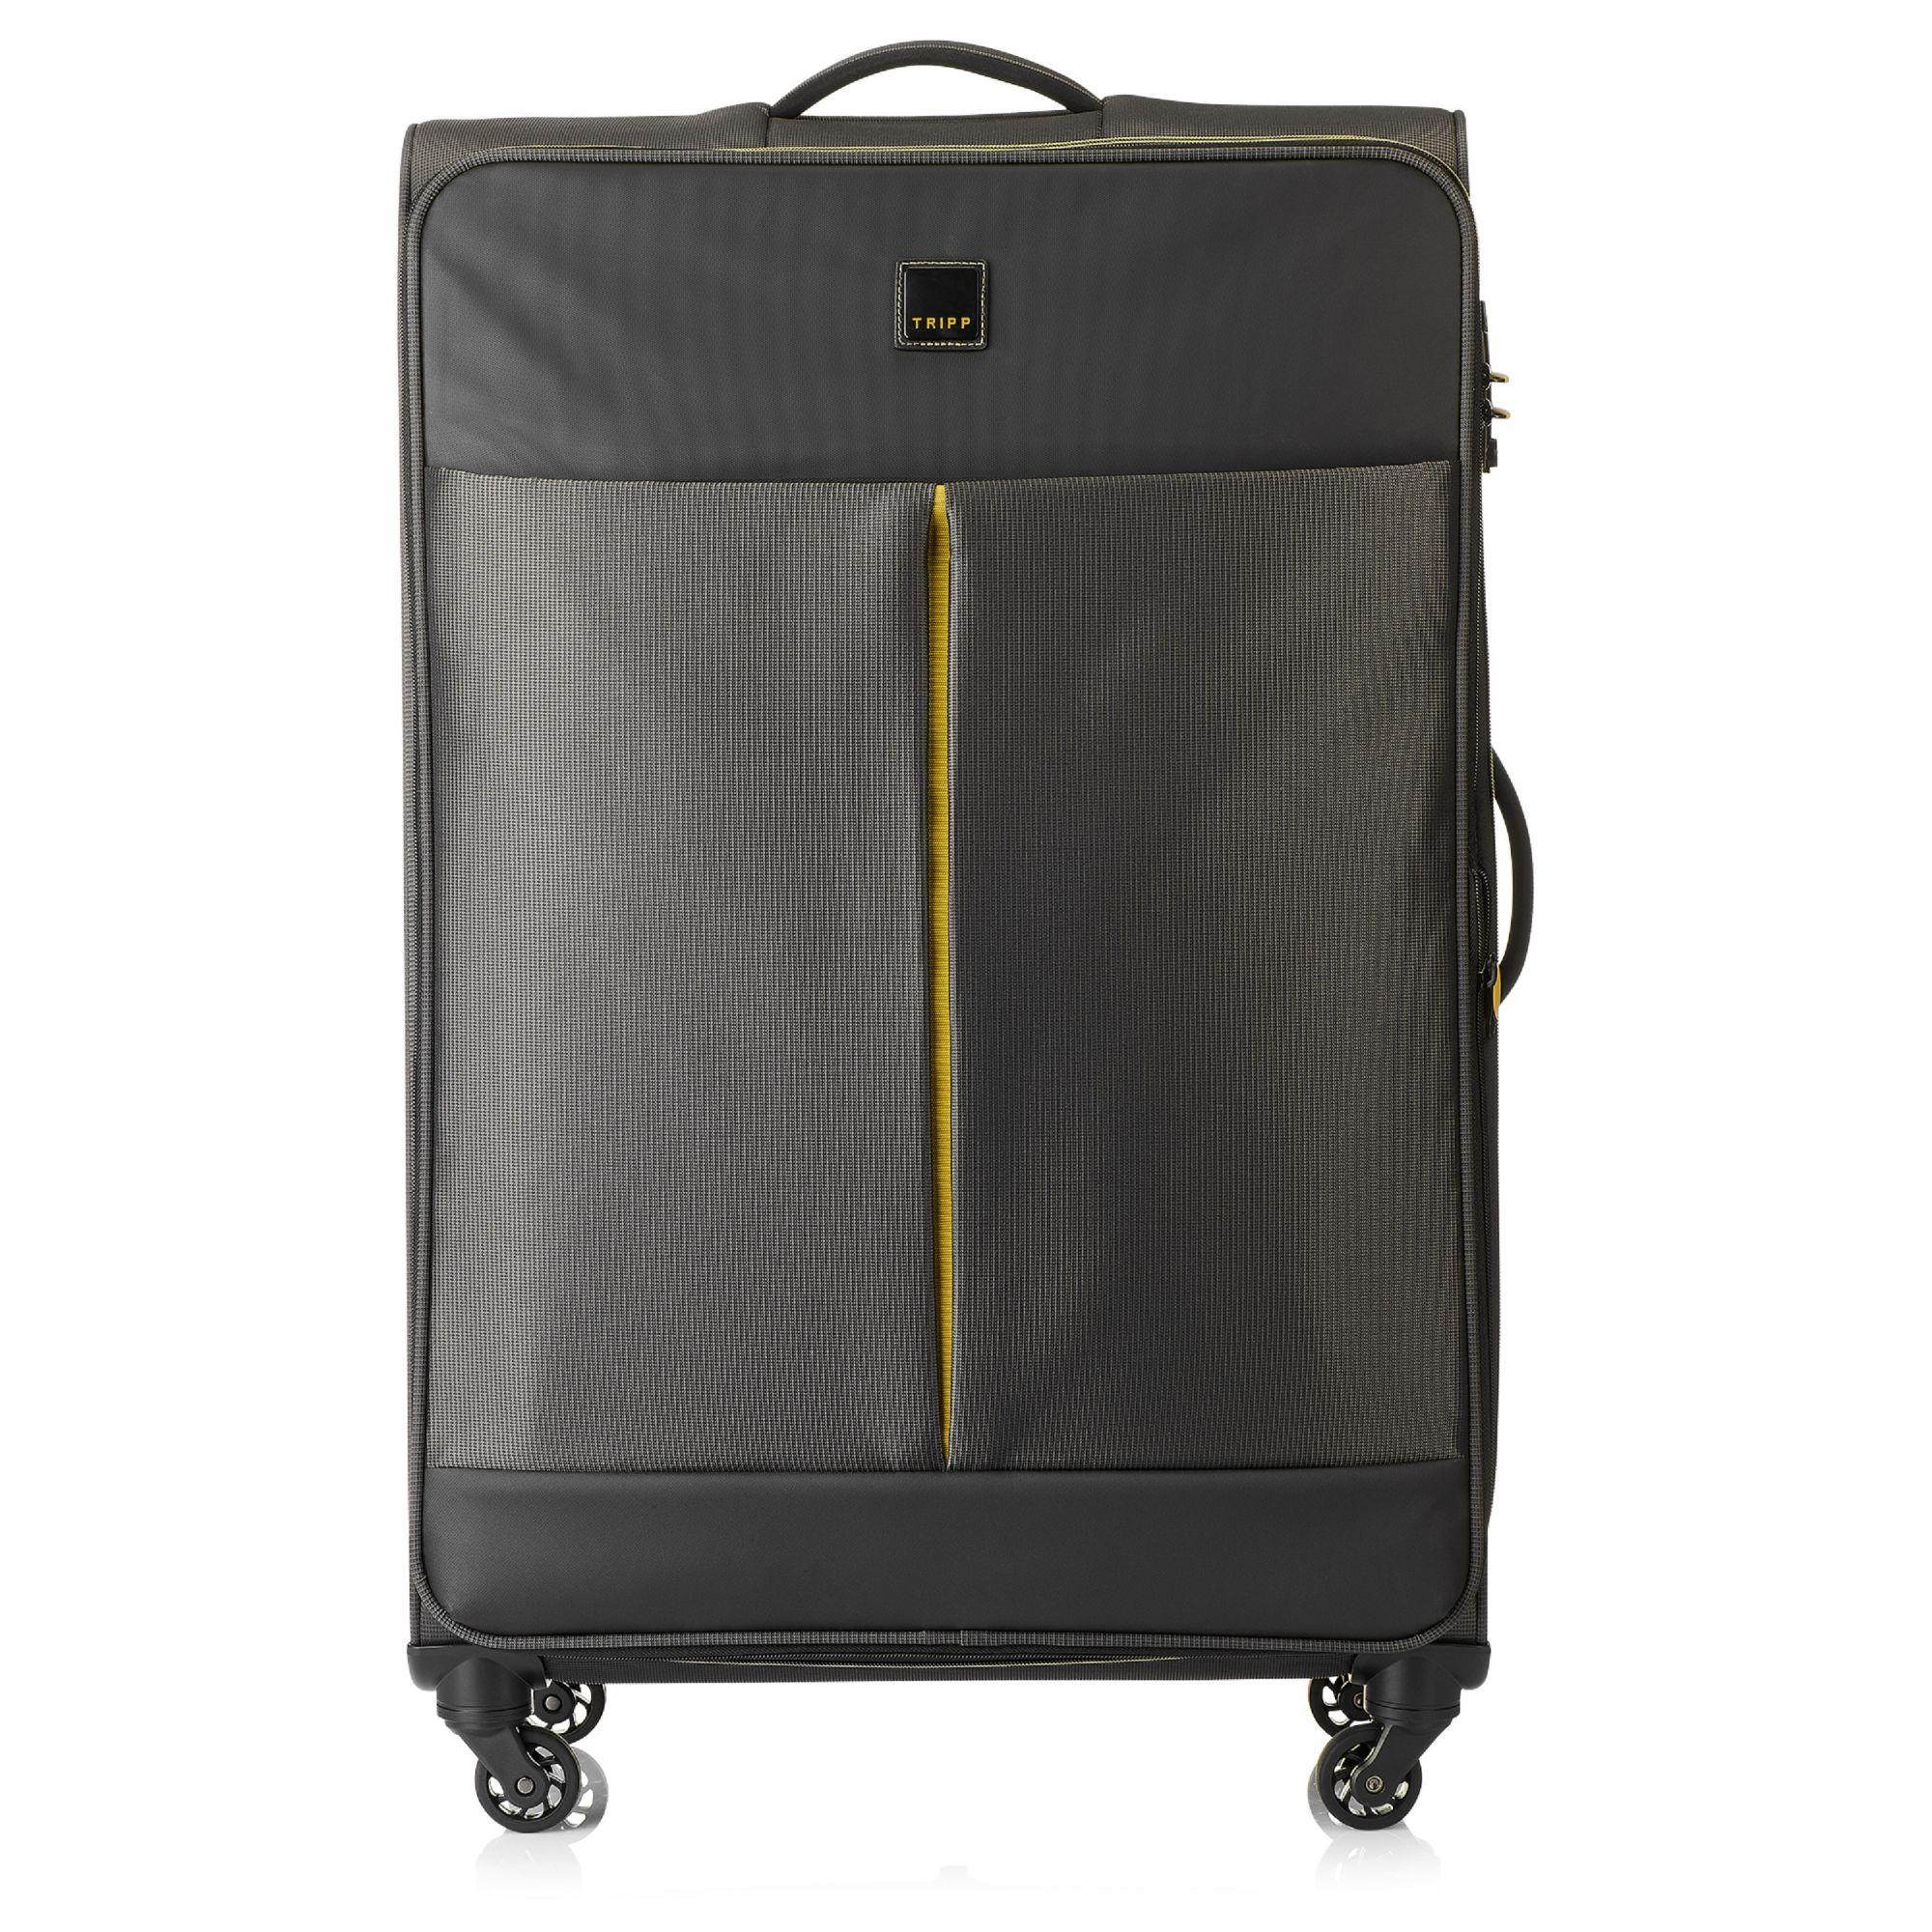 tripp graphite 39 style lite 39 large 4 wheel suitcase soft. Black Bedroom Furniture Sets. Home Design Ideas